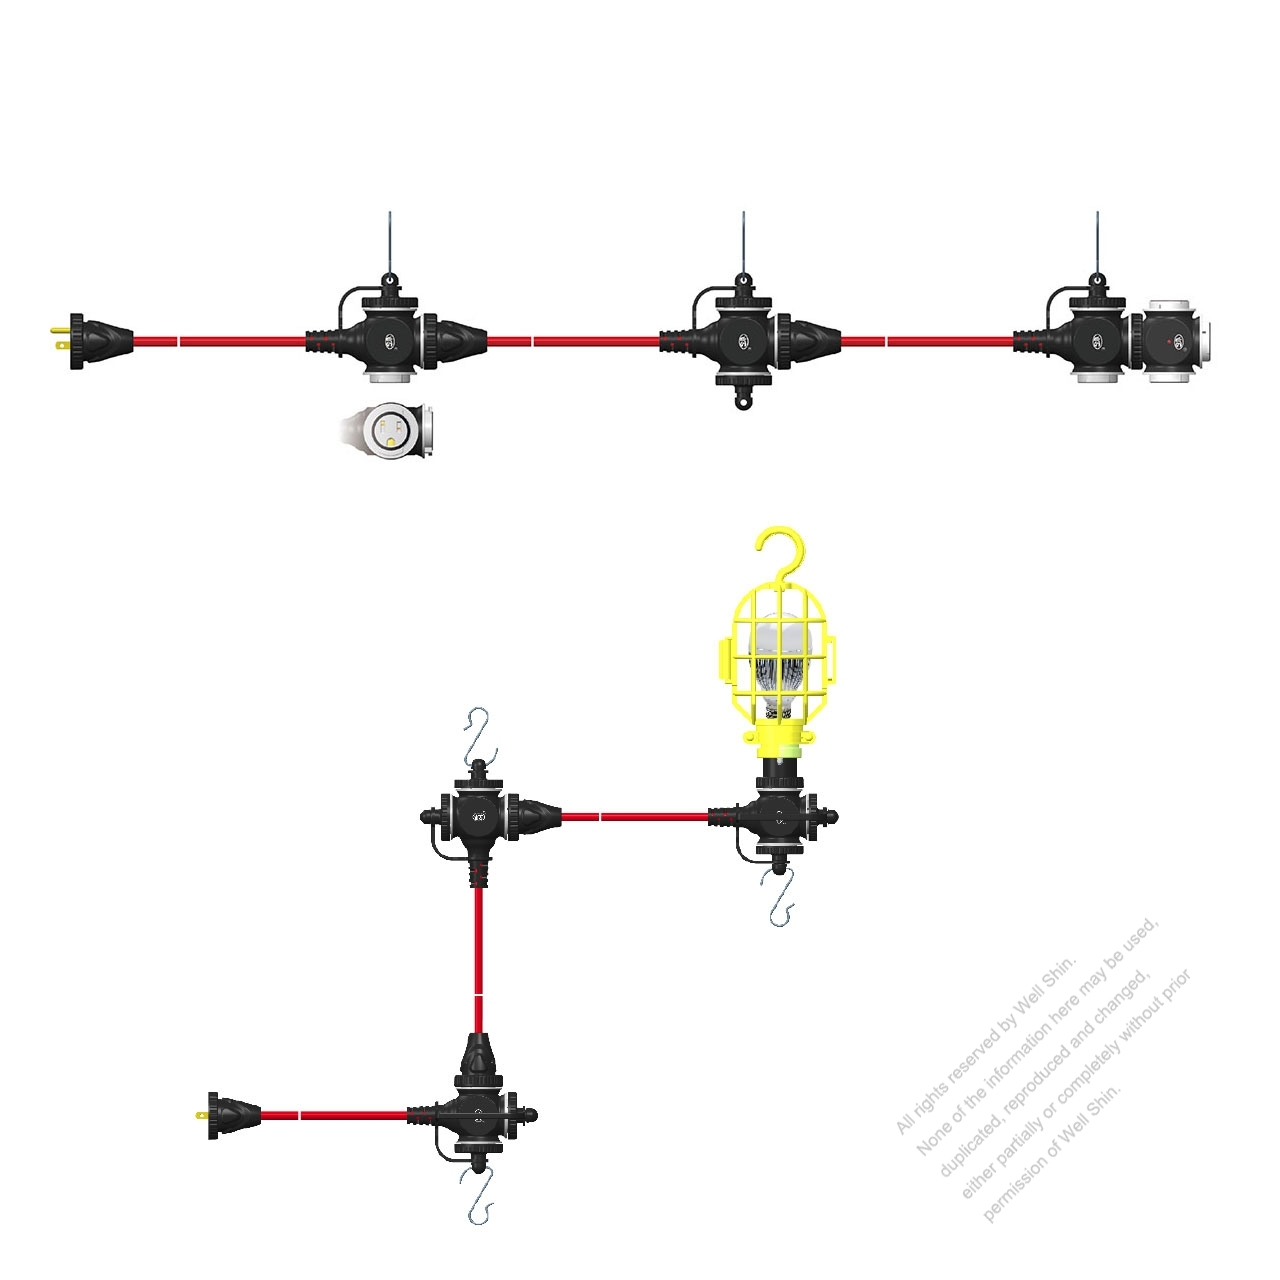 japan 2 pin locking cord nema 1 1